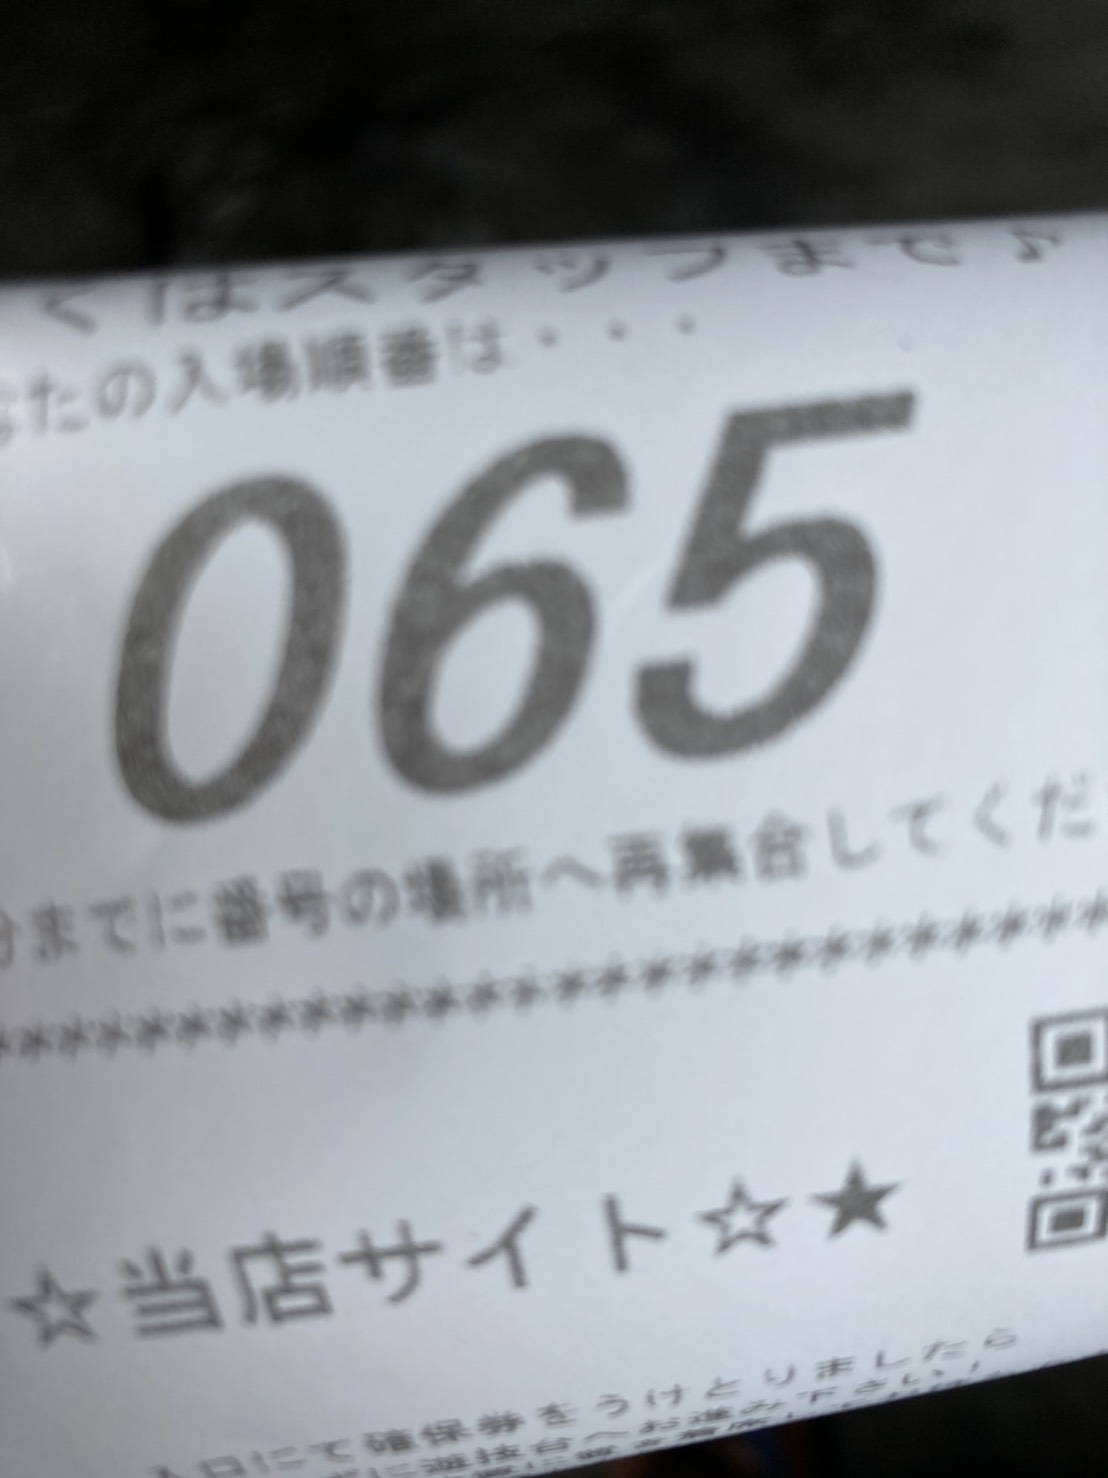 f6ee2a991b2284929b2b6d908e620e8d764d439d